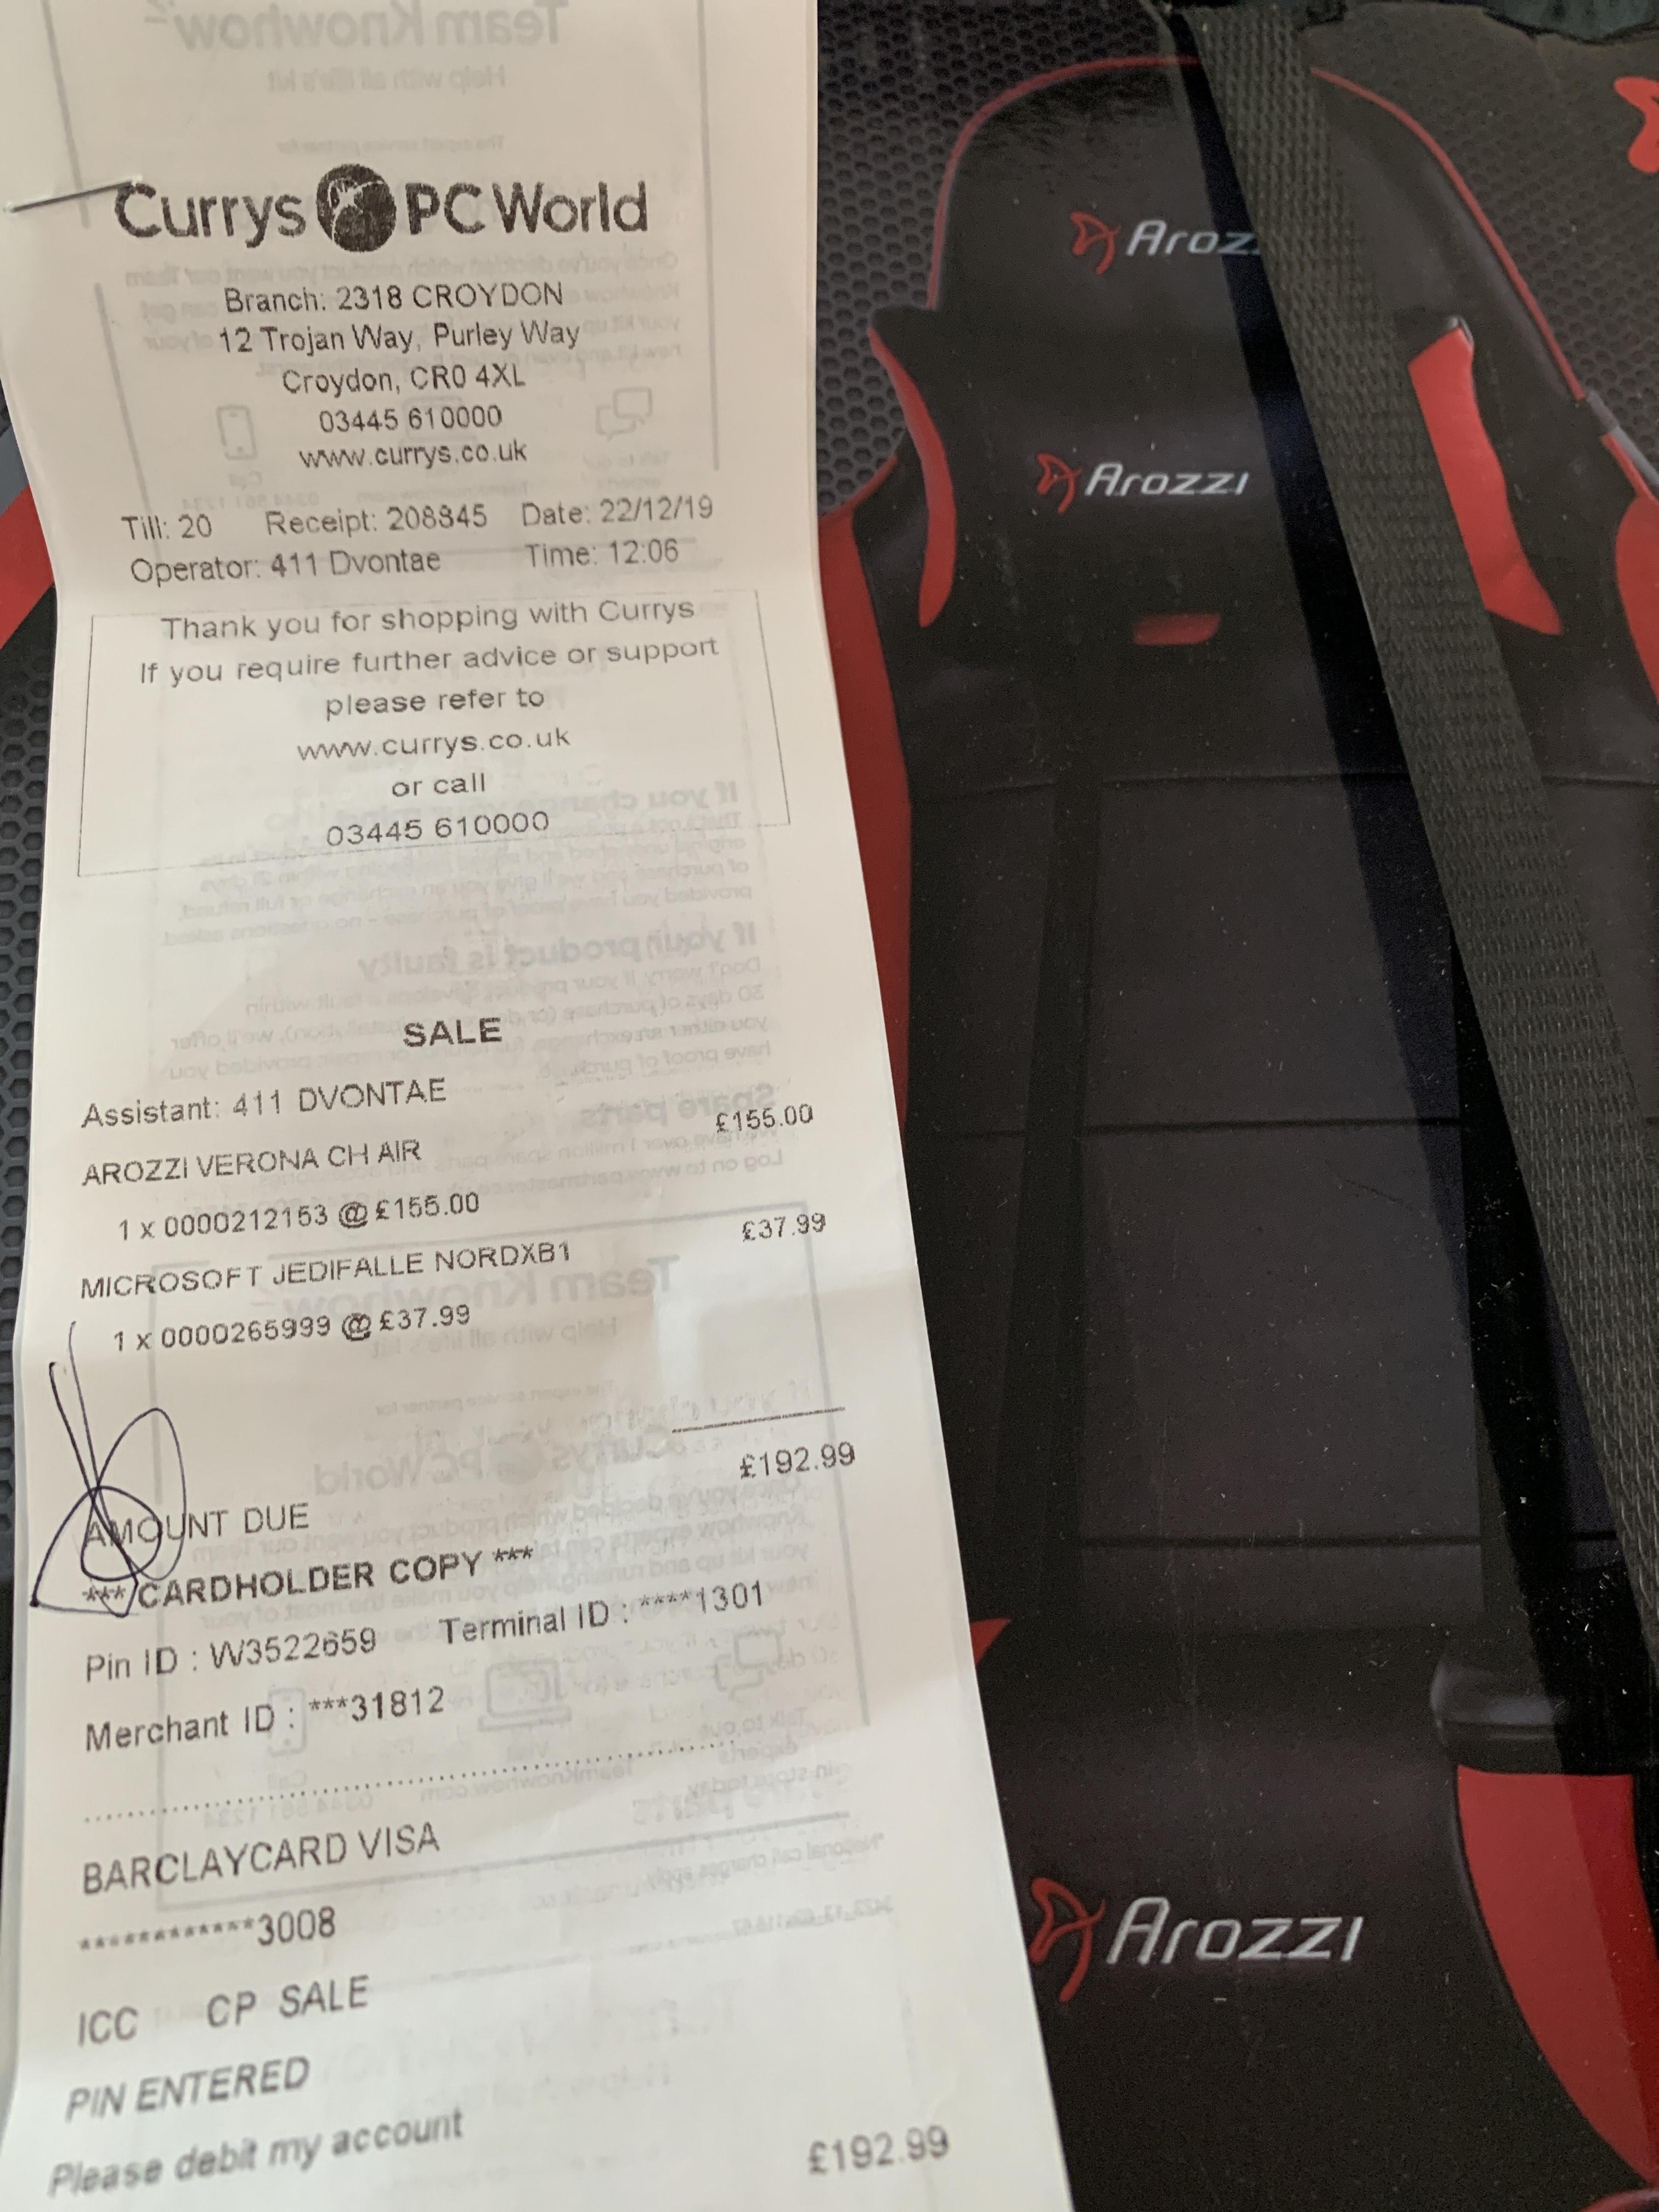 Arozzi Verona V2 Premium Gaming Chair £155 @ Currys PC World